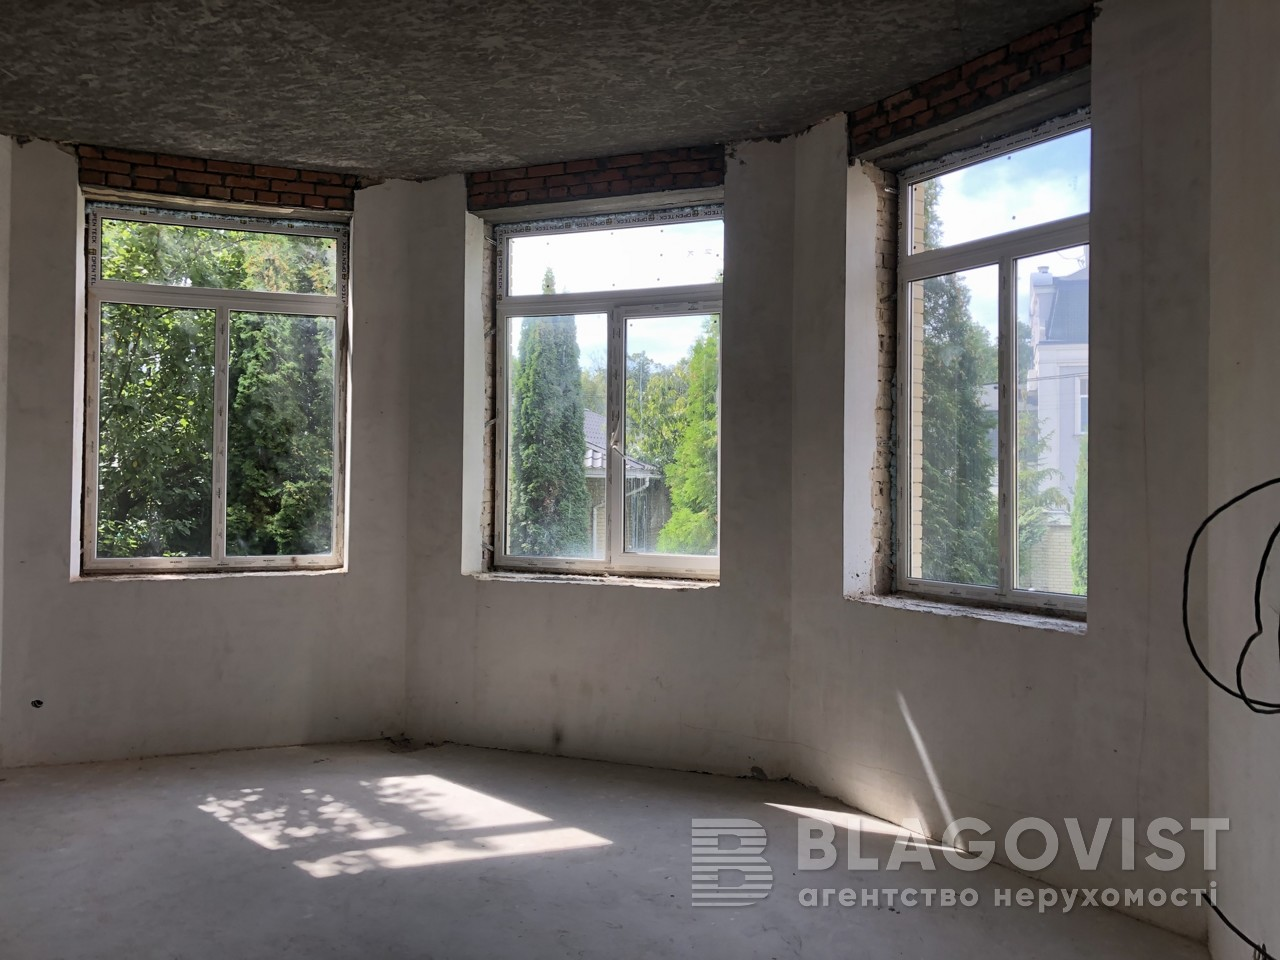 Квартира C-109816, Клавдии Радченко, 14, Киев - Фото 4